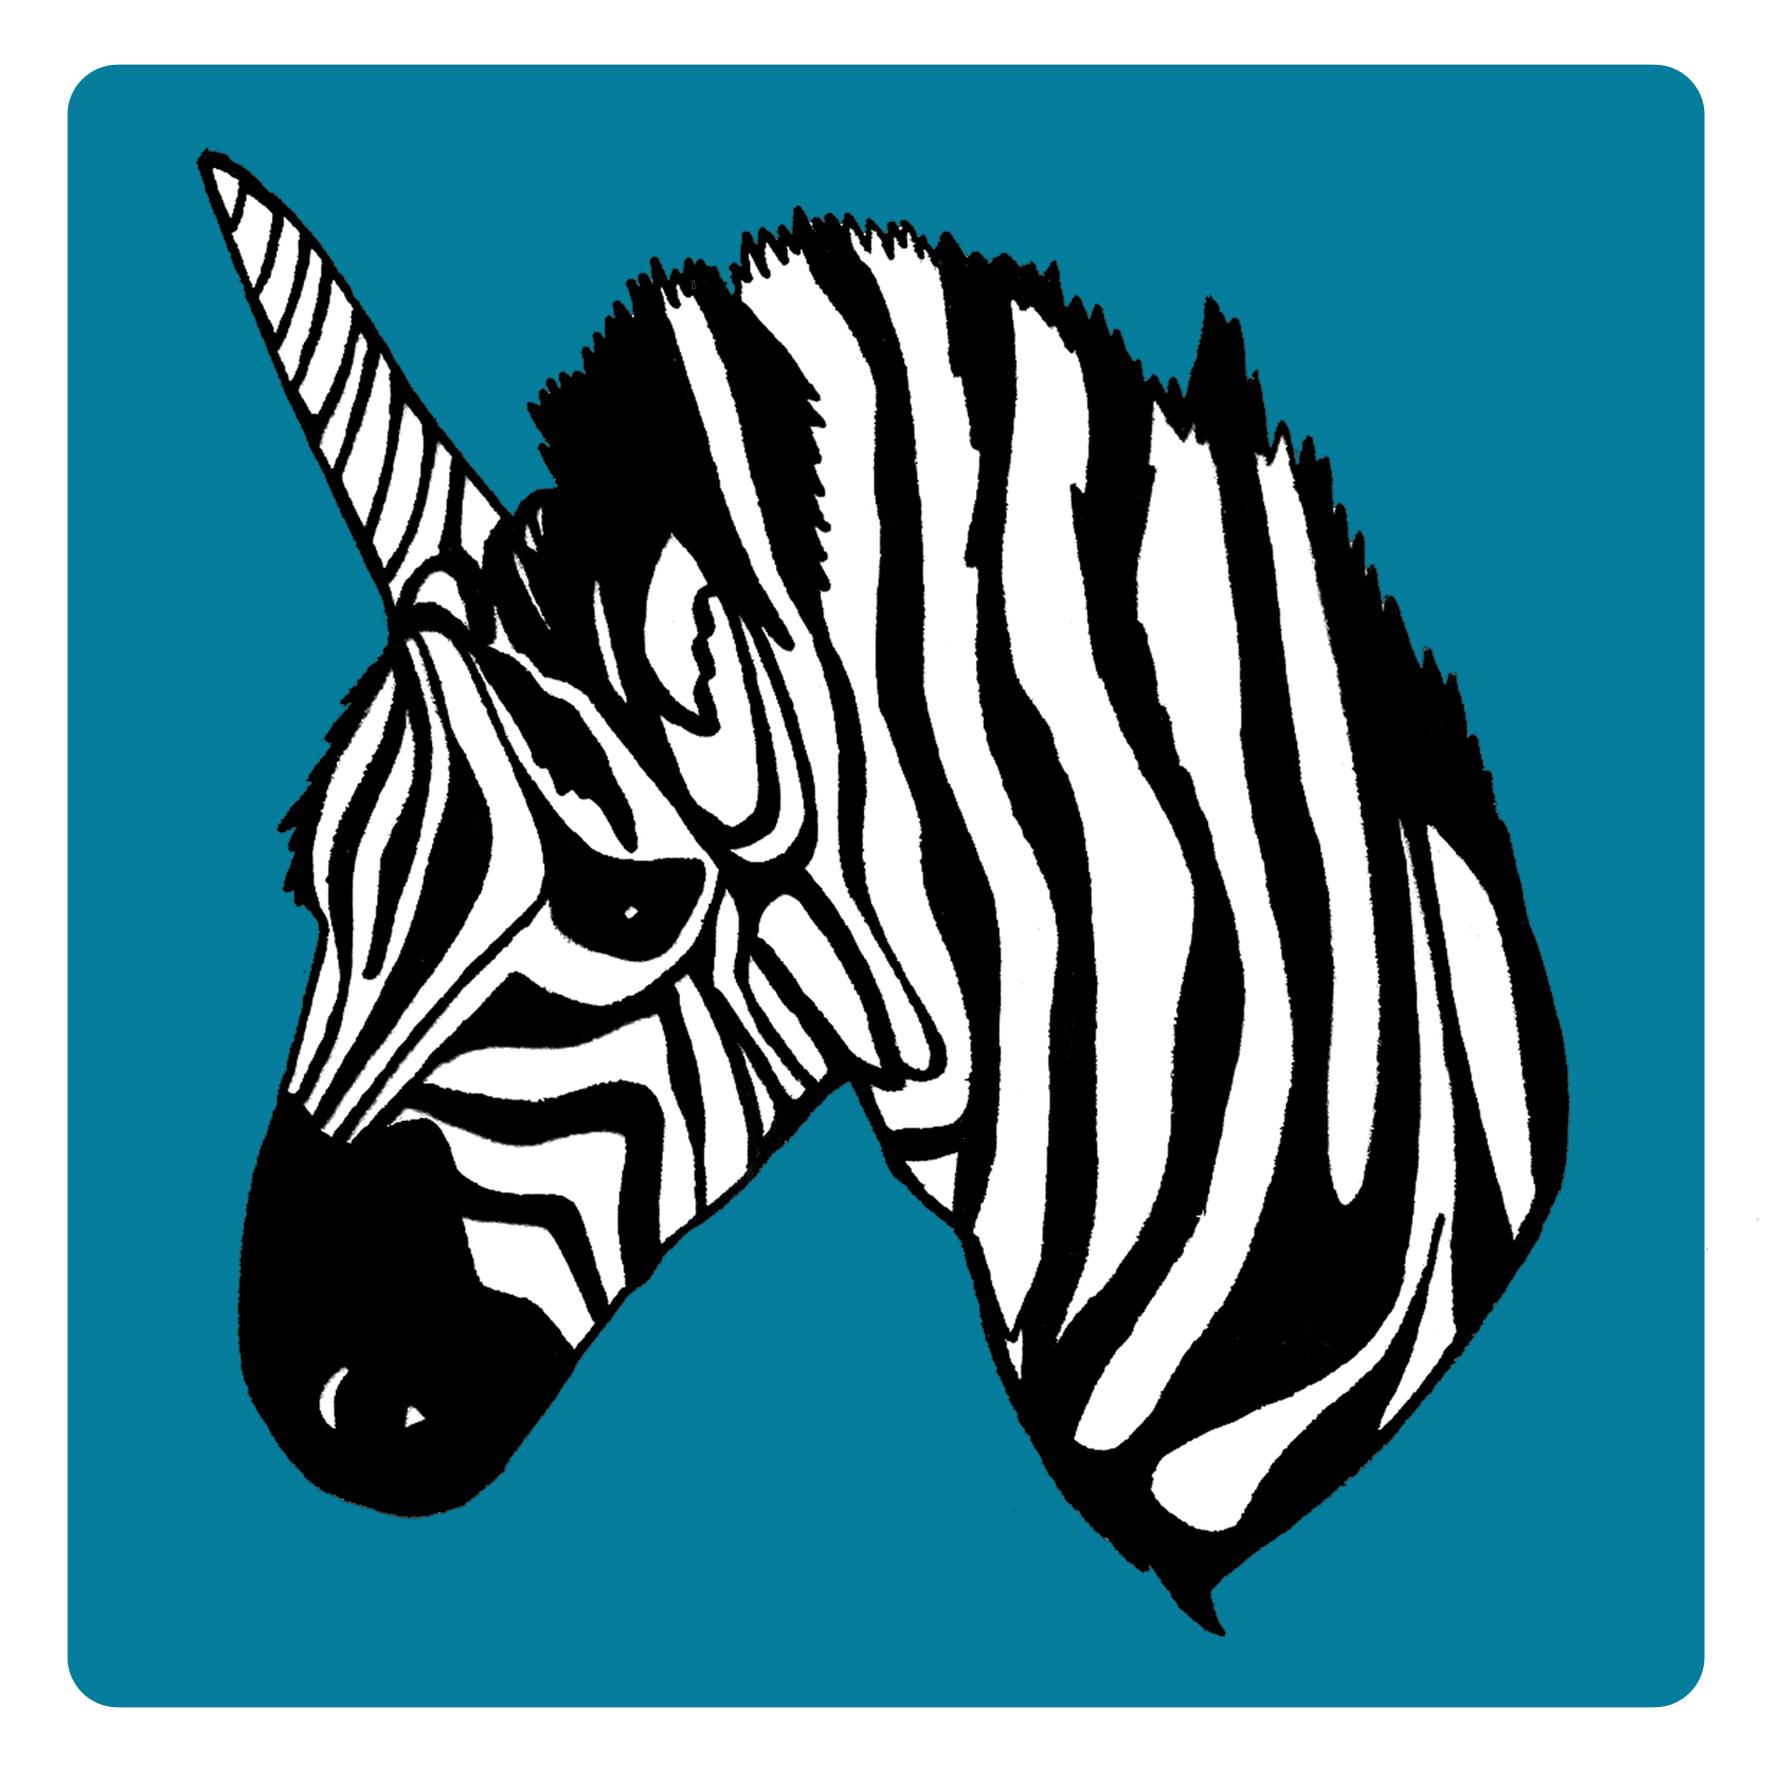 NEW_DESIGNS_Zebra_Unicorn_TURQUOISE.jpg